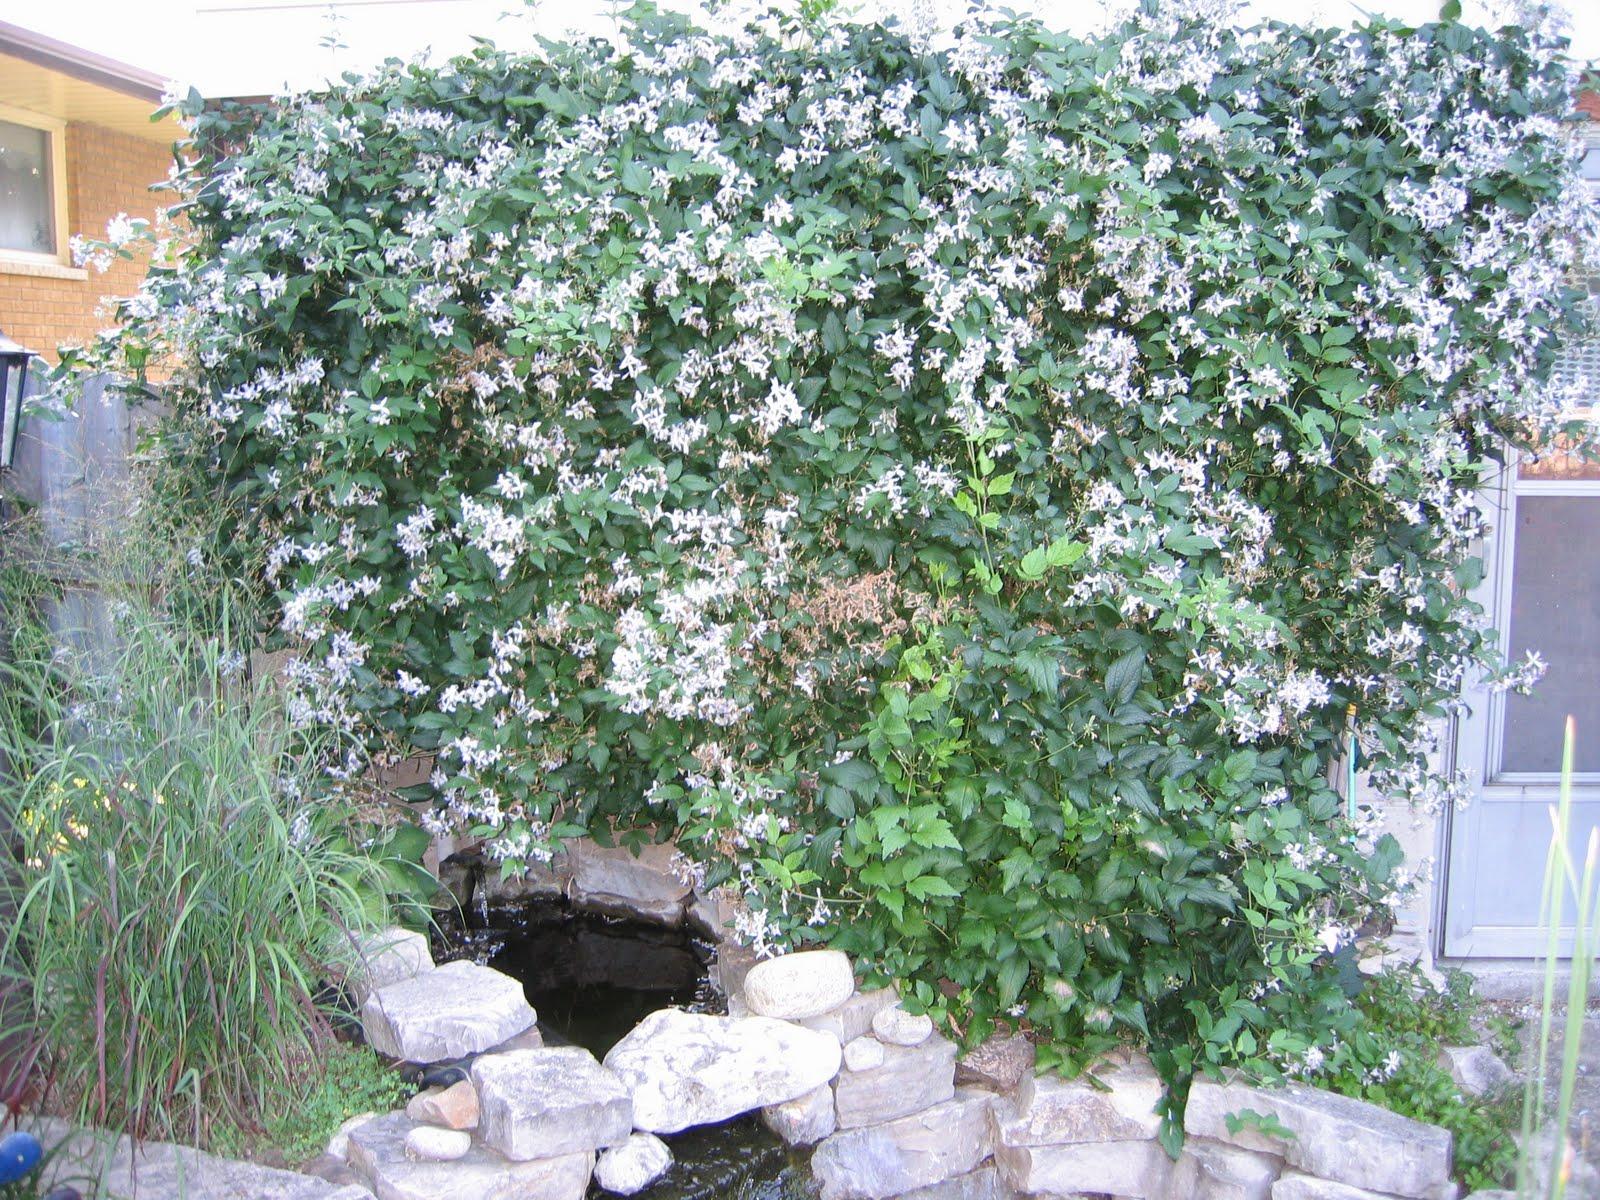 Adventures in Horticulture - KHS Blog